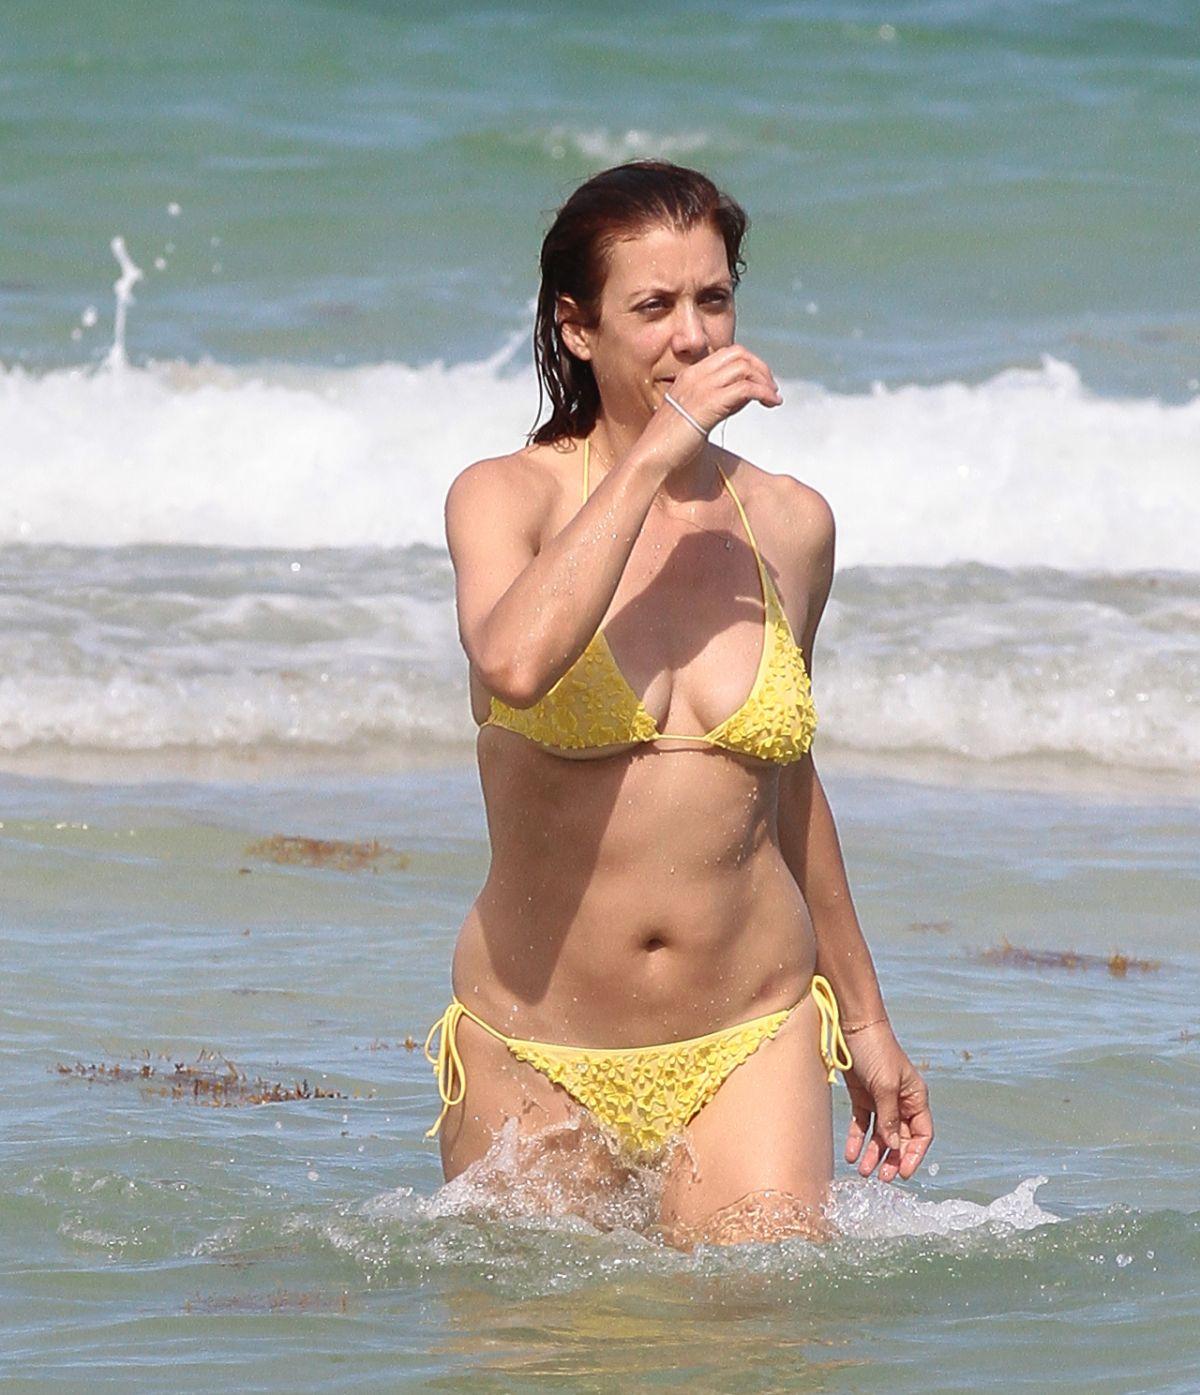 speaking, beyonce bikini body consider, that you